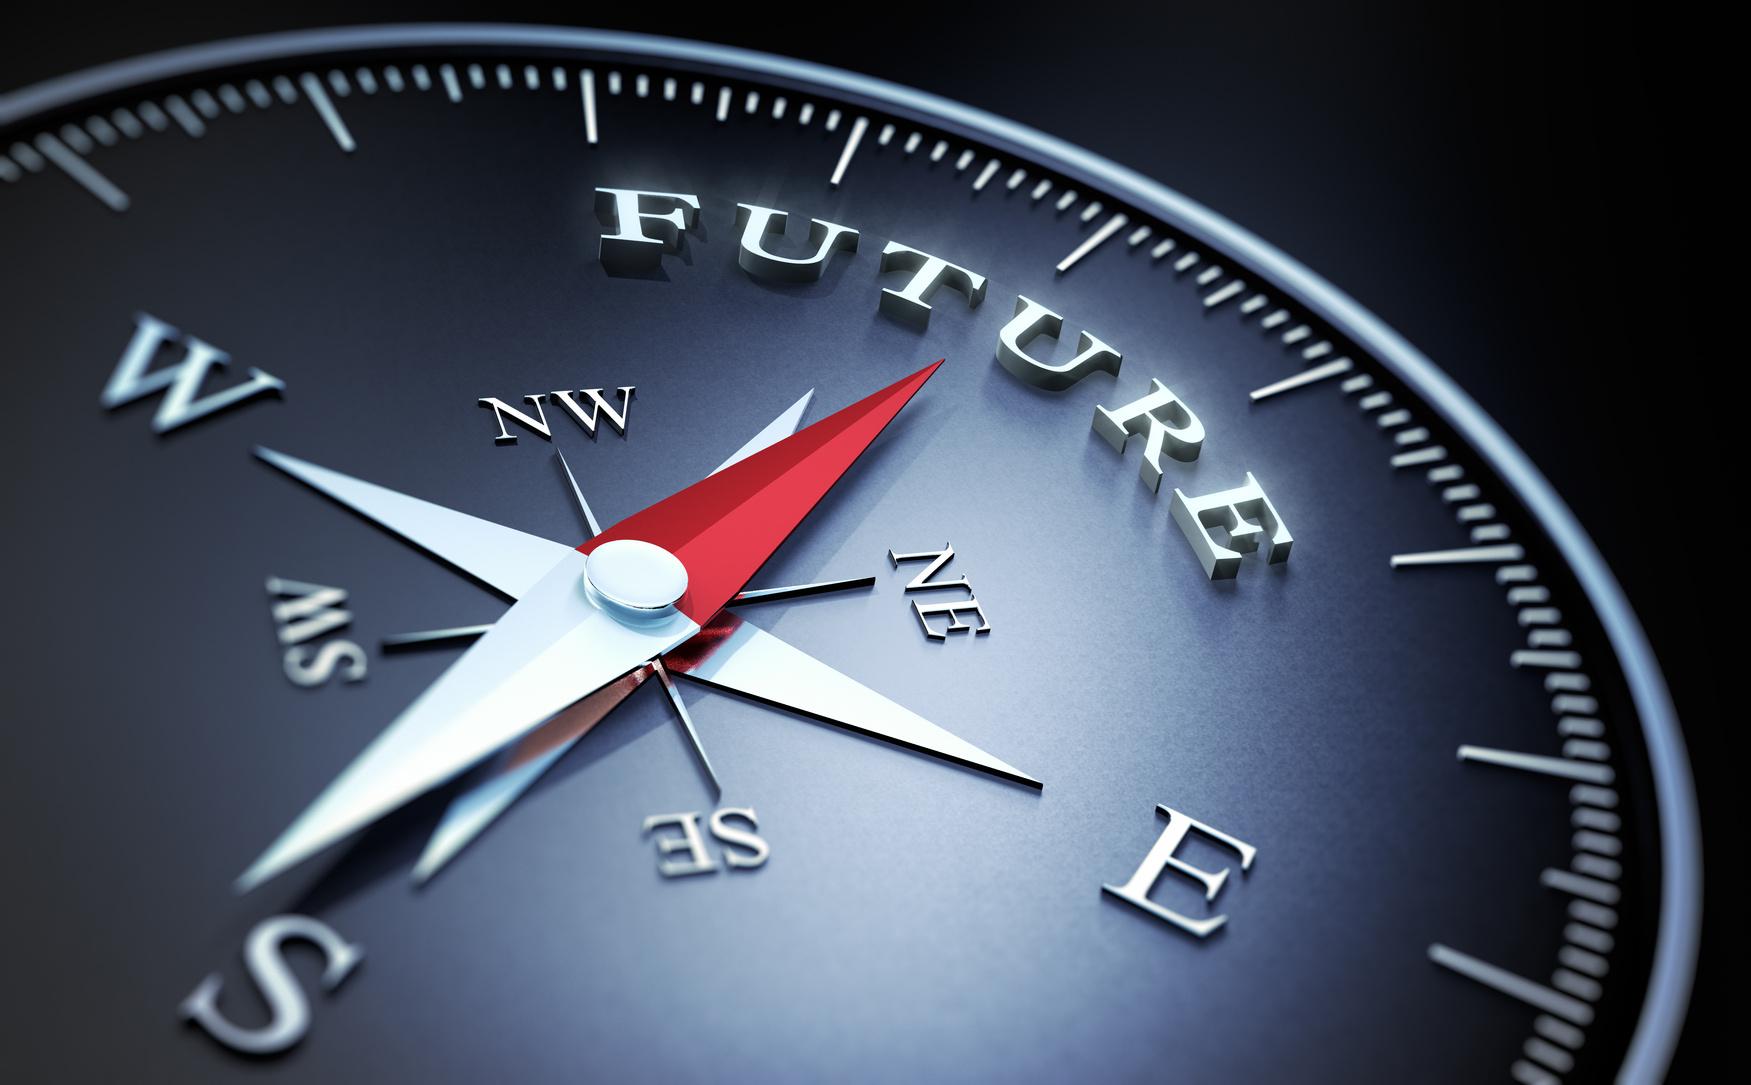 Kompass - Future